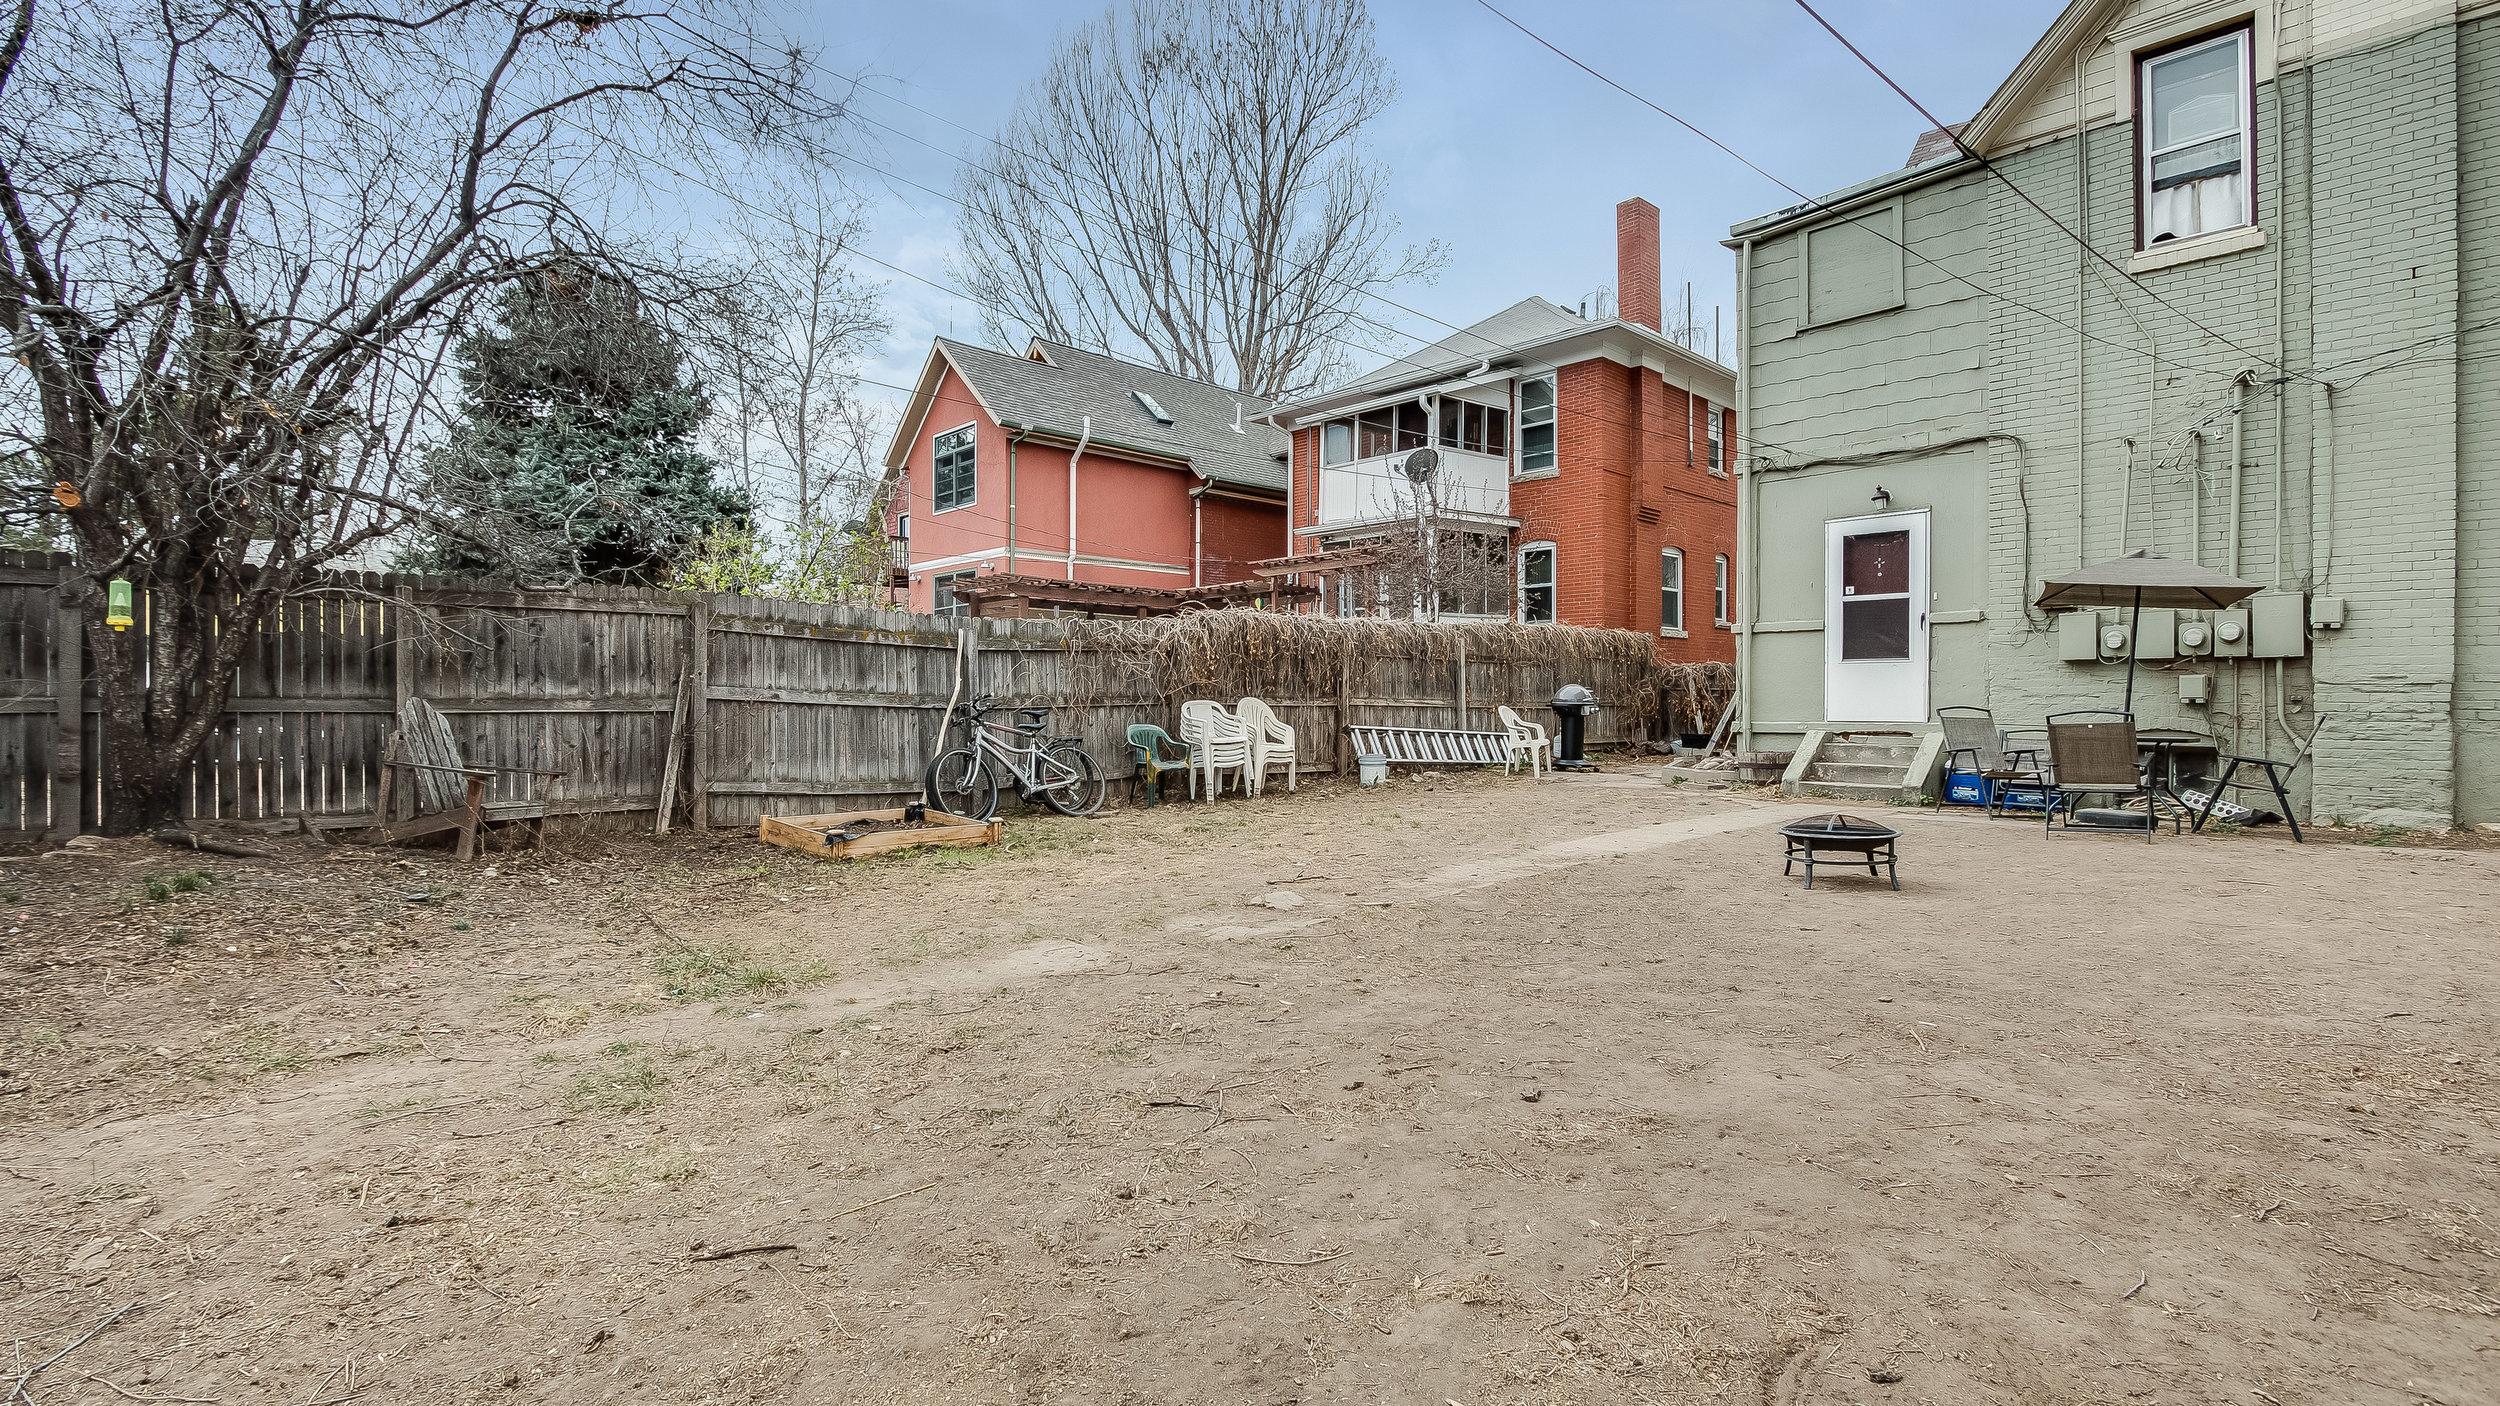 25 1570stpaul Back Yard (22).jpg